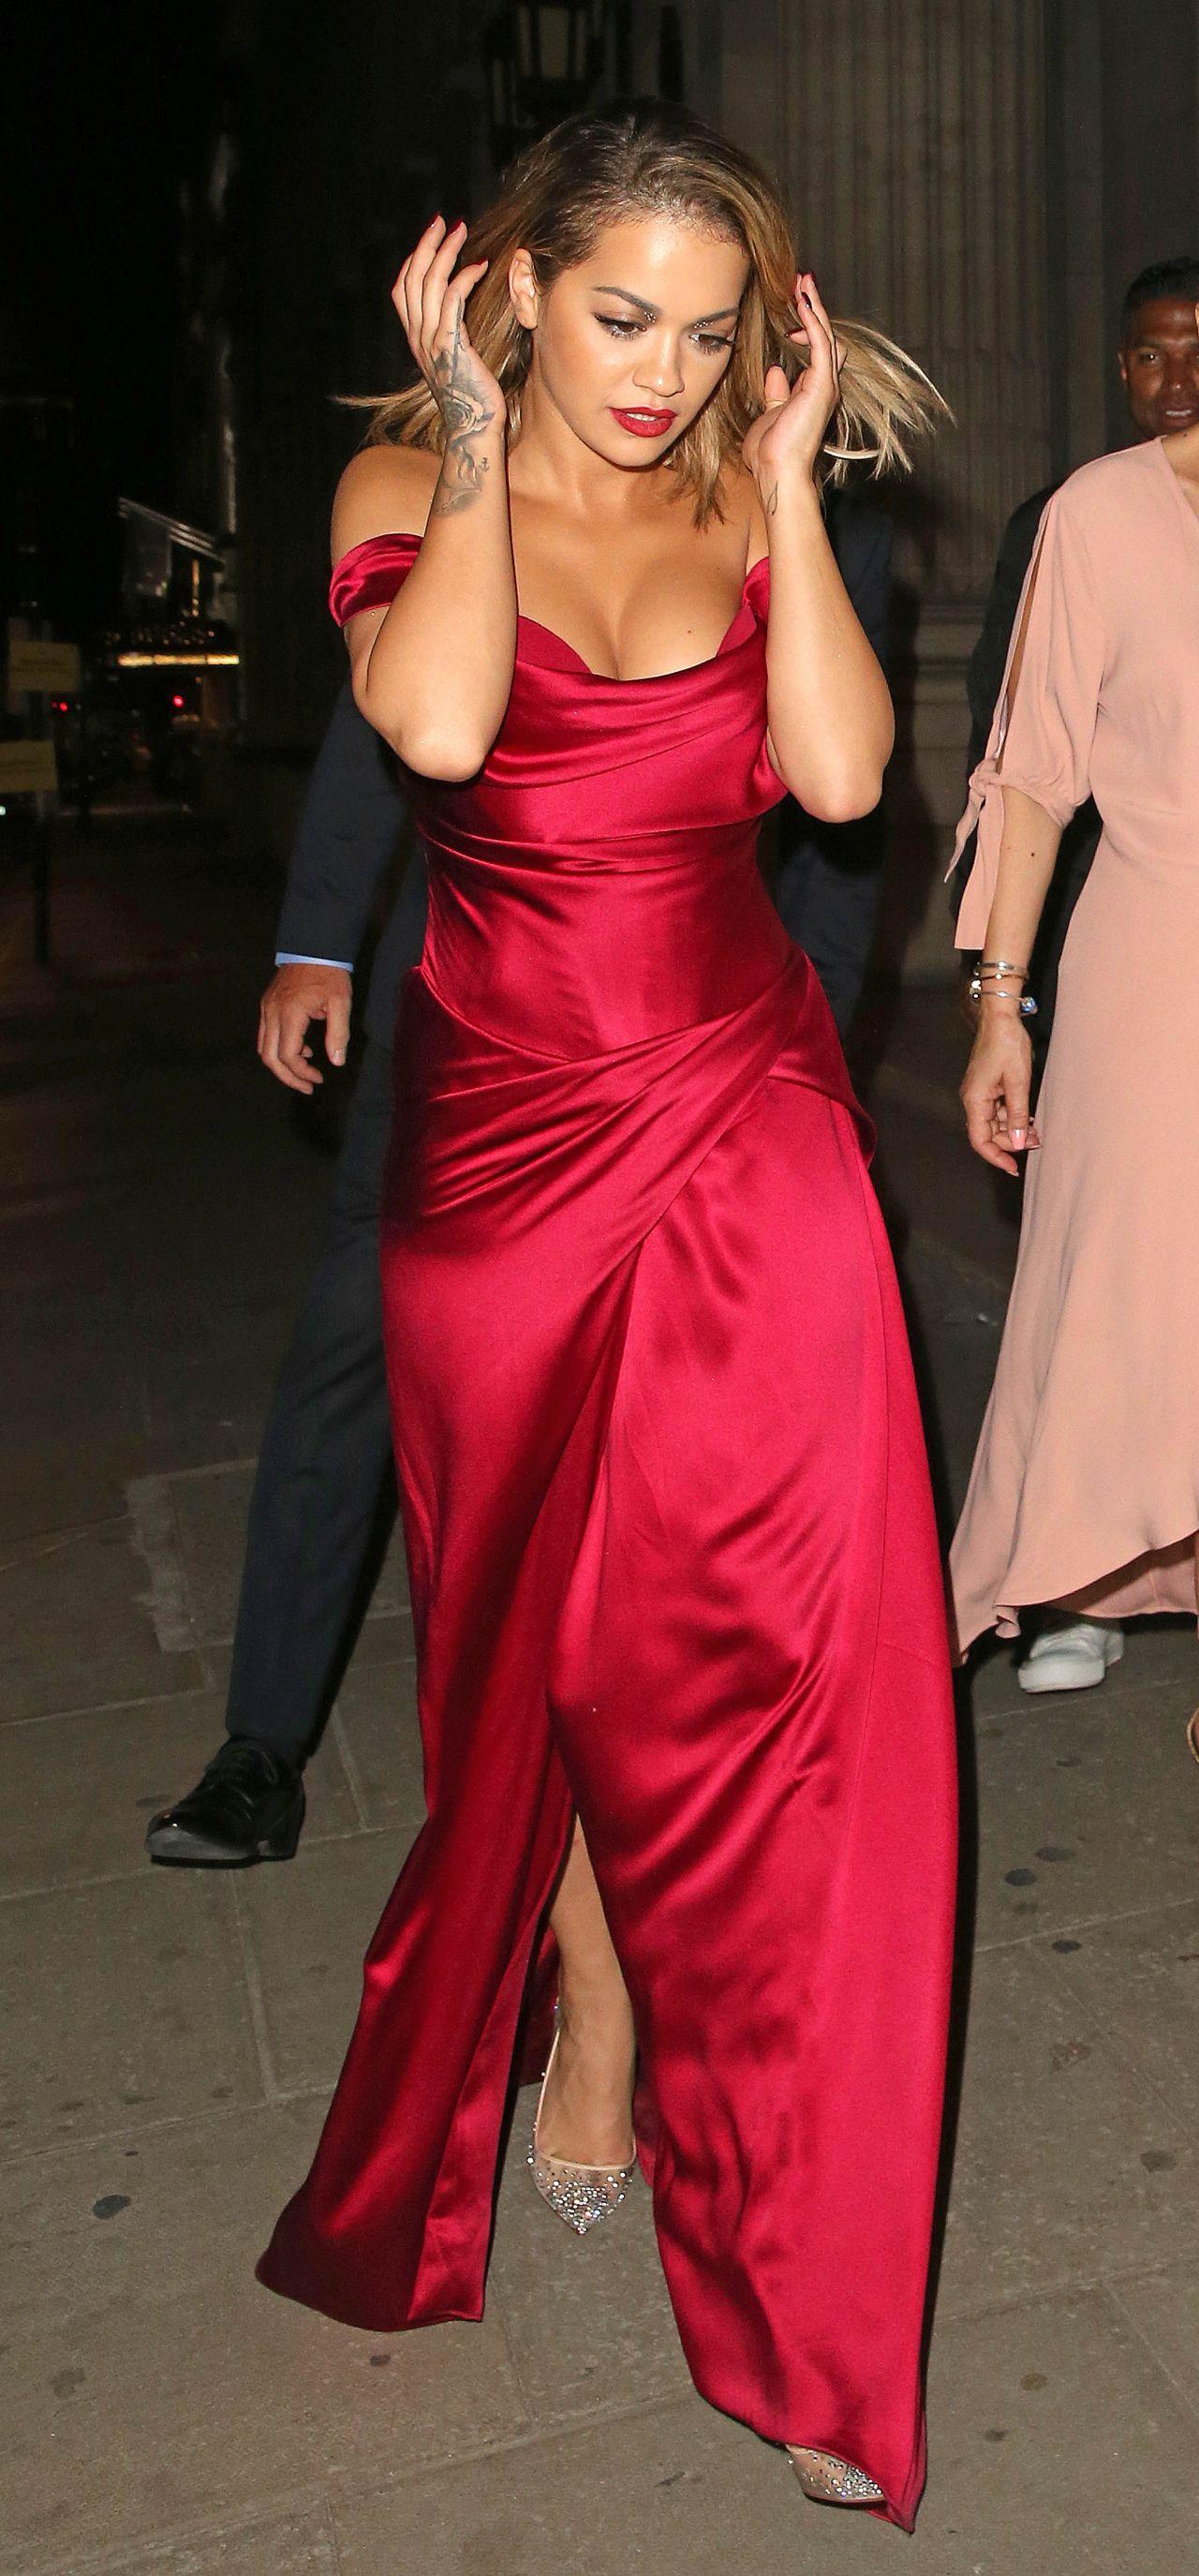 Rita Ora In Red Dress Cartier Event At Freemasons Hall